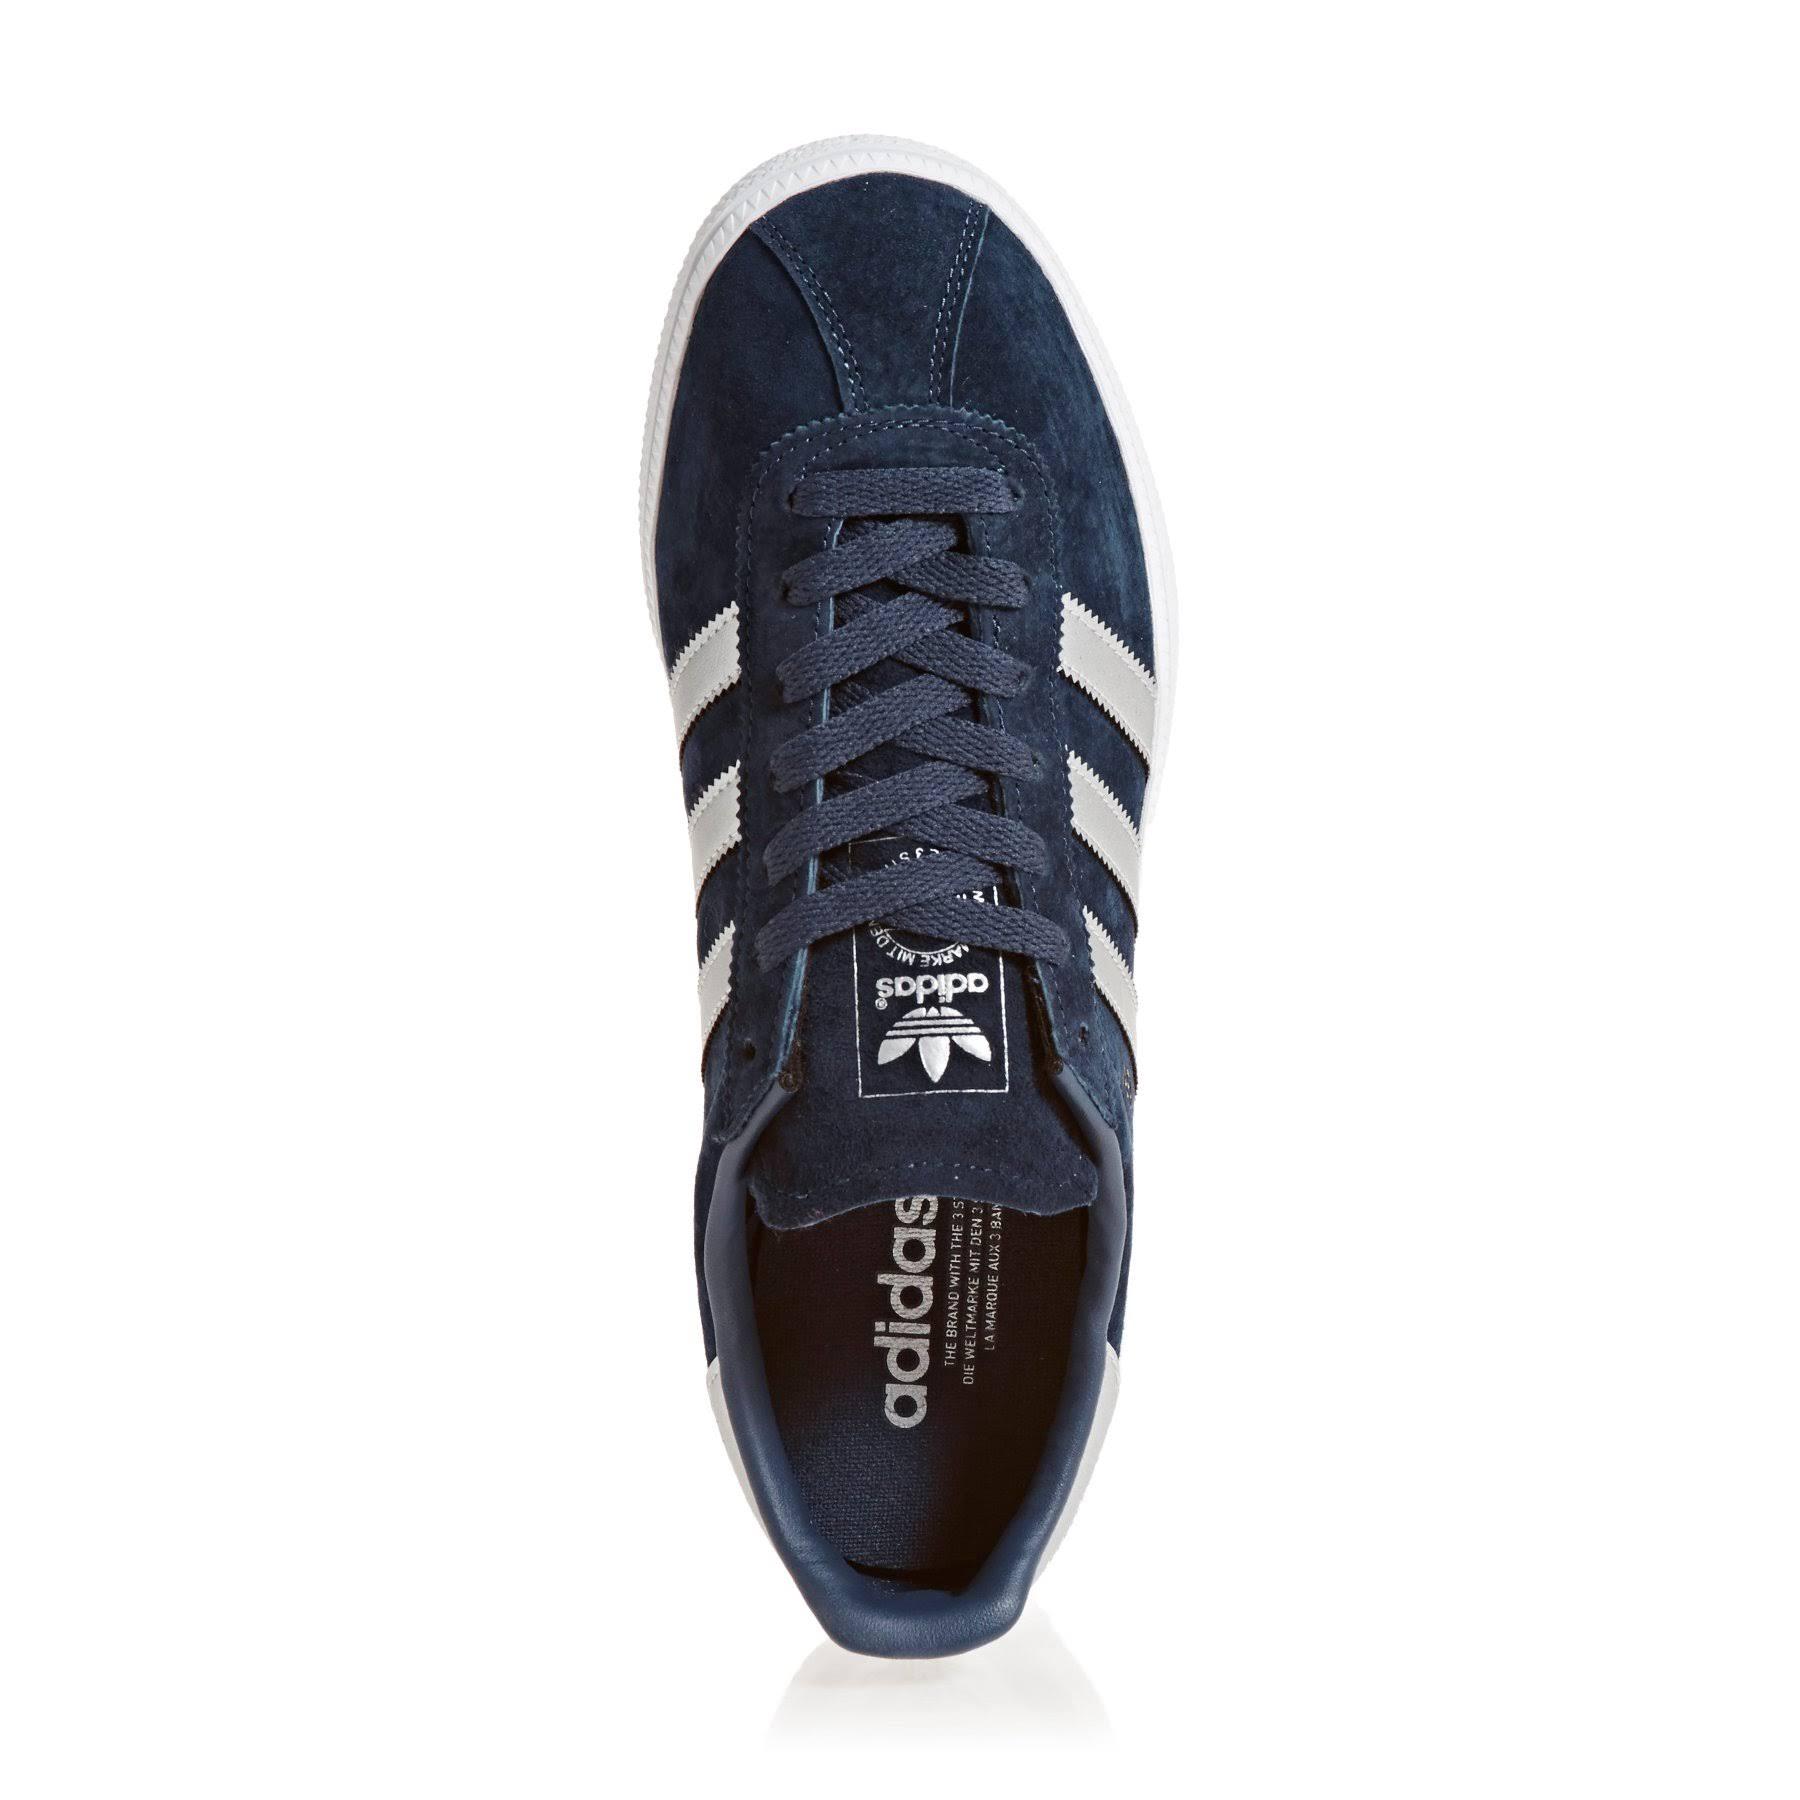 Originals 1 3 39 Yo Adidas Munchen SZCaCq